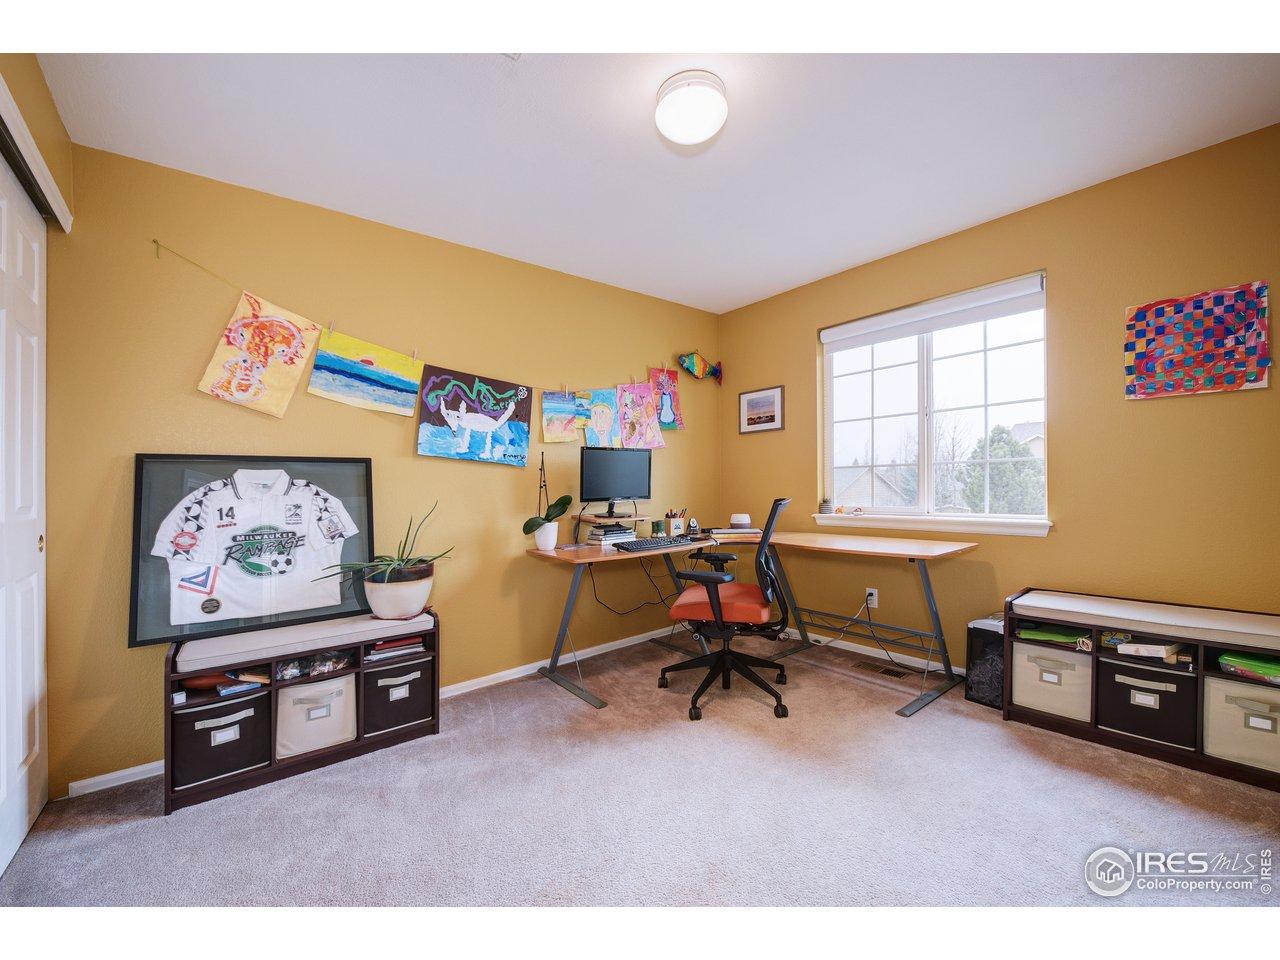 Bedroom 4 or Study